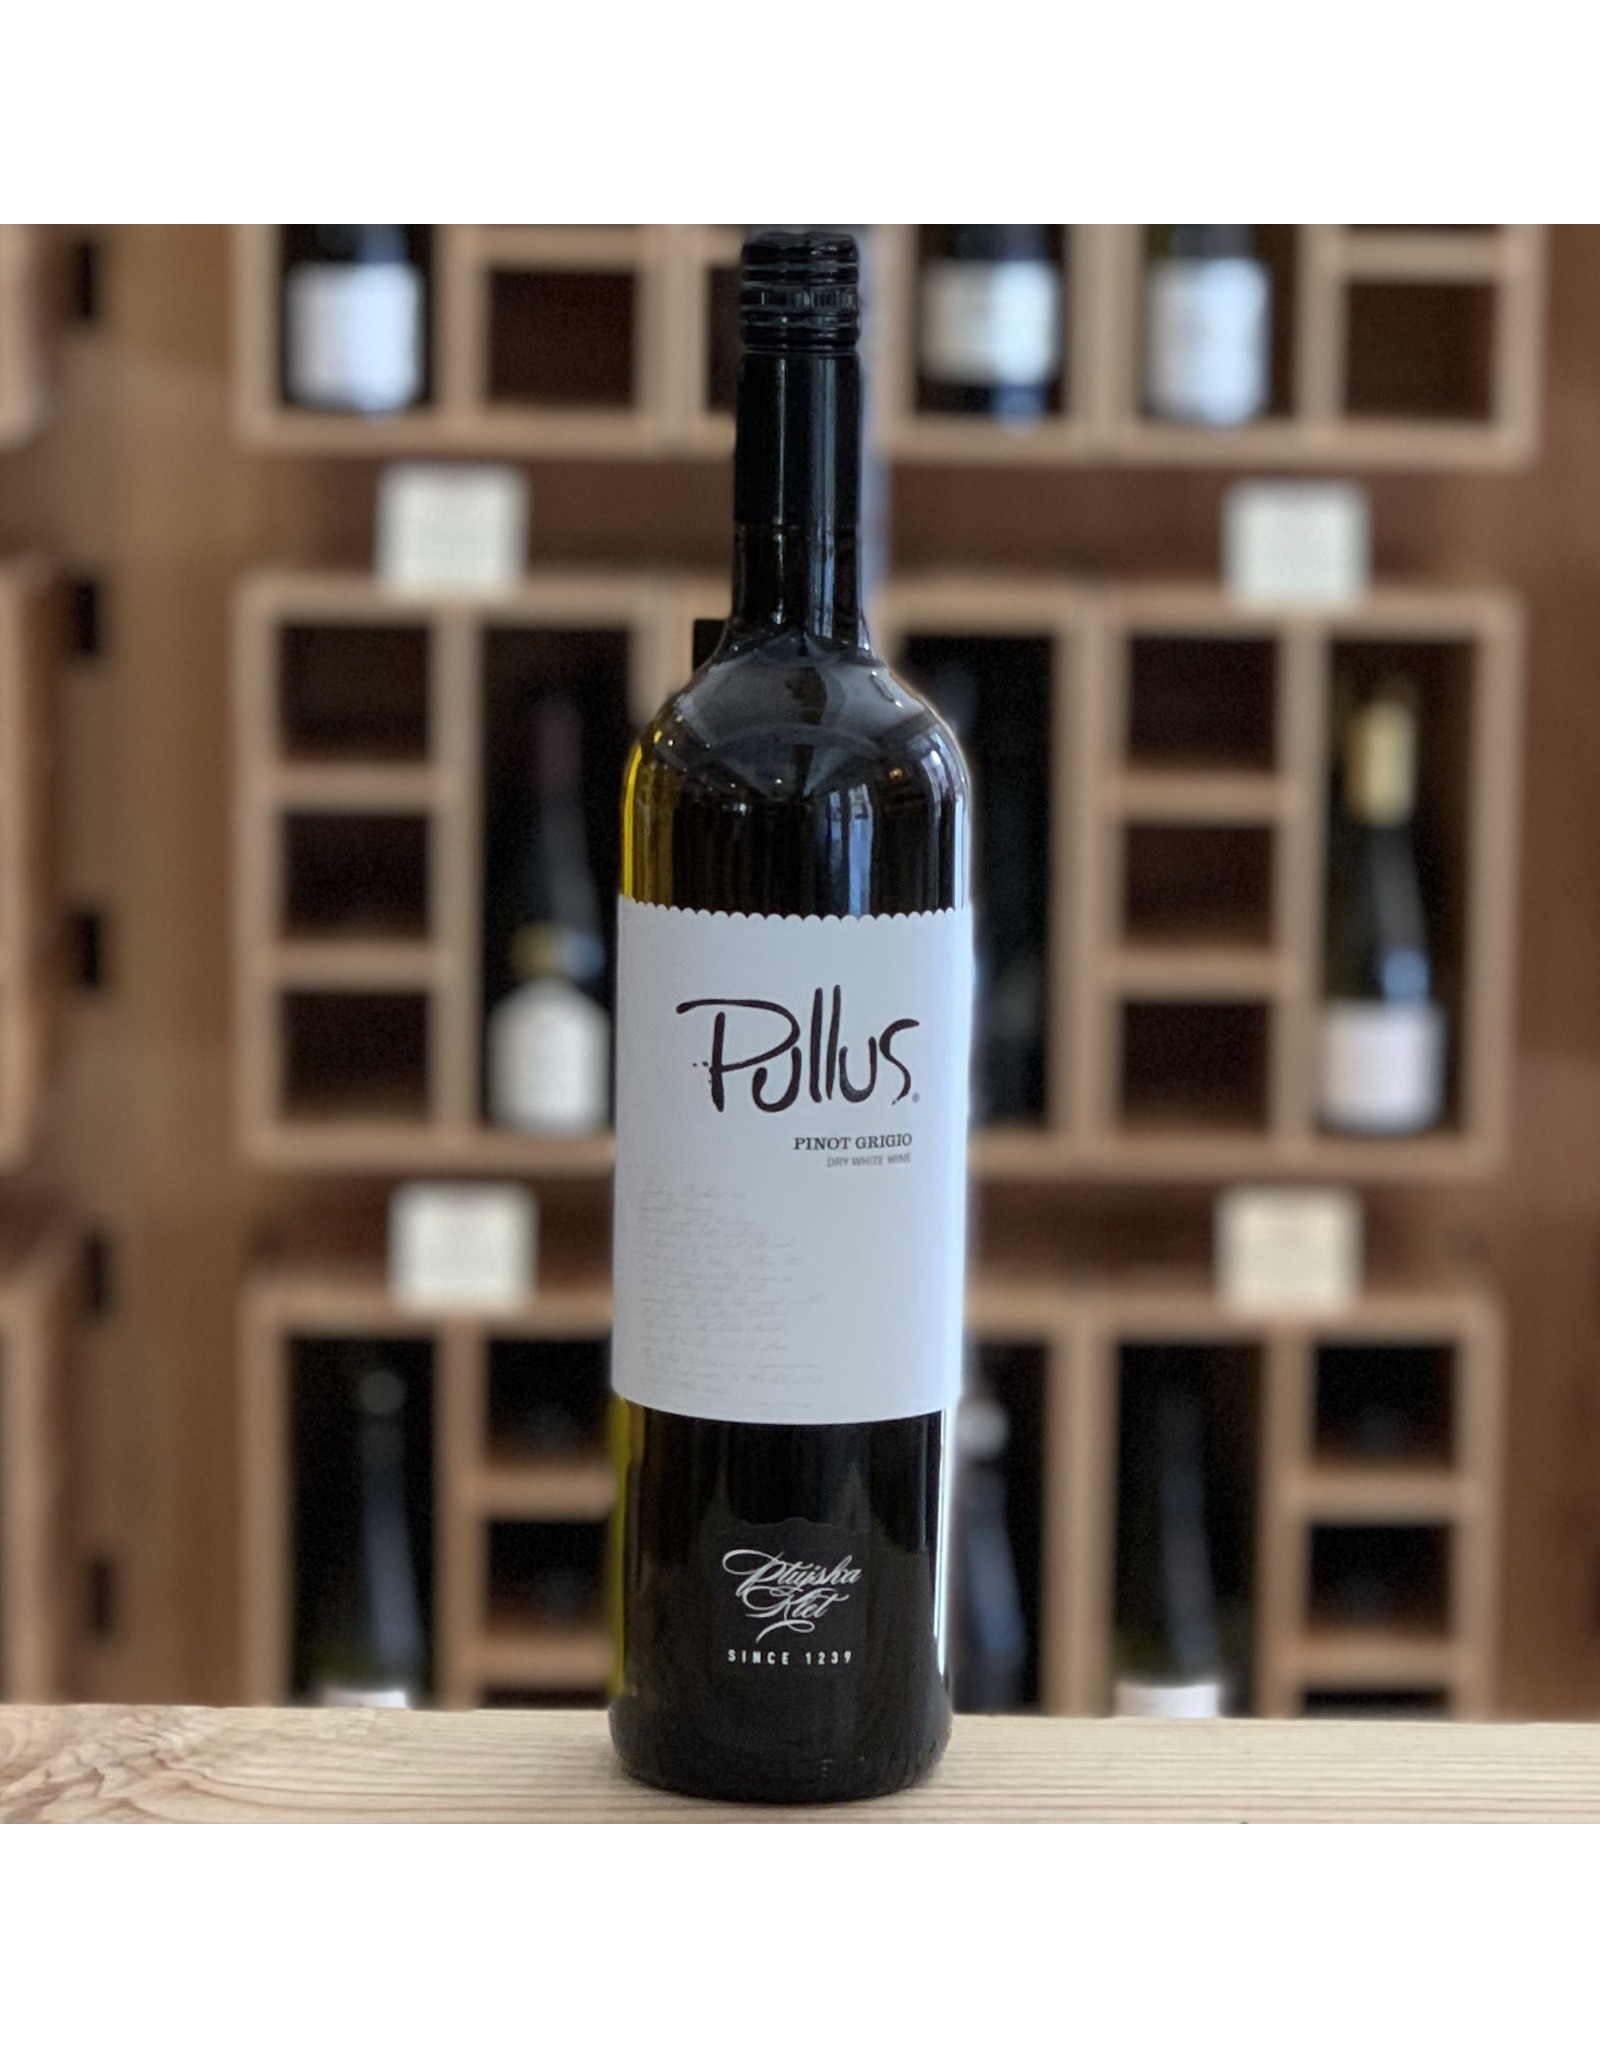 Slovenia Pullus Pinot Grigio 2019- Podravje, Slovenia